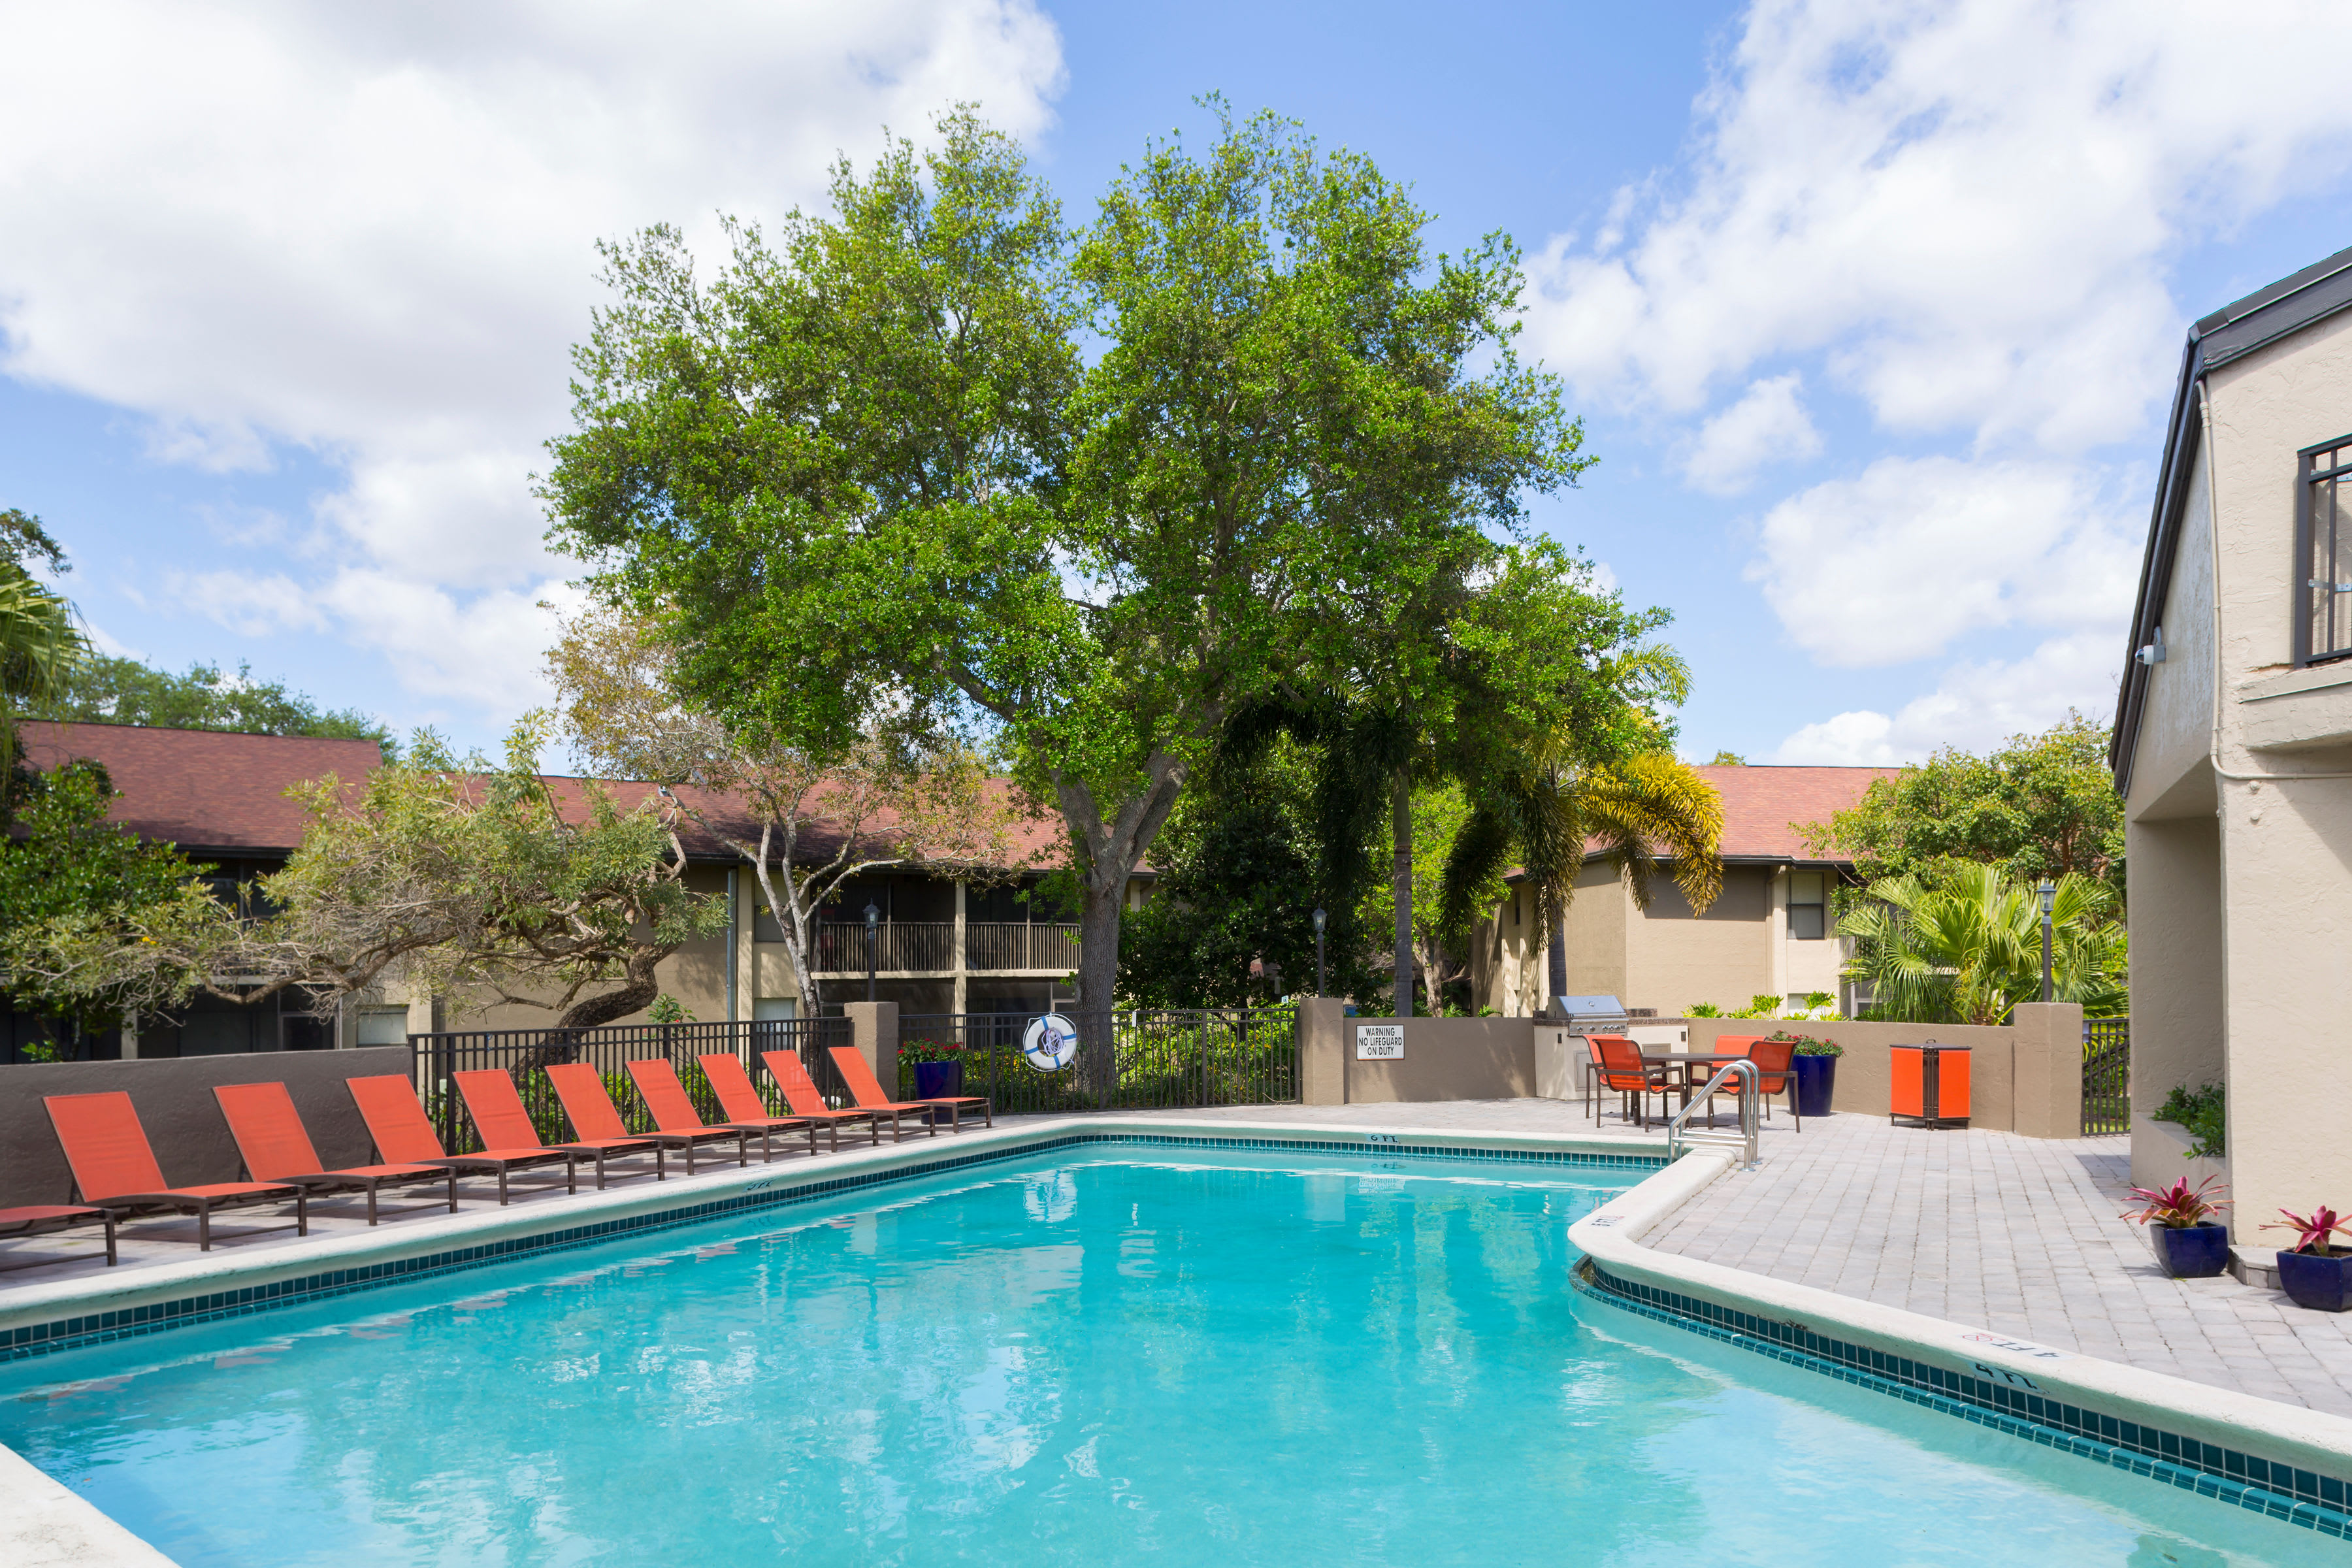 Swimming pool area at Siena Apartments in Plantation, Florida